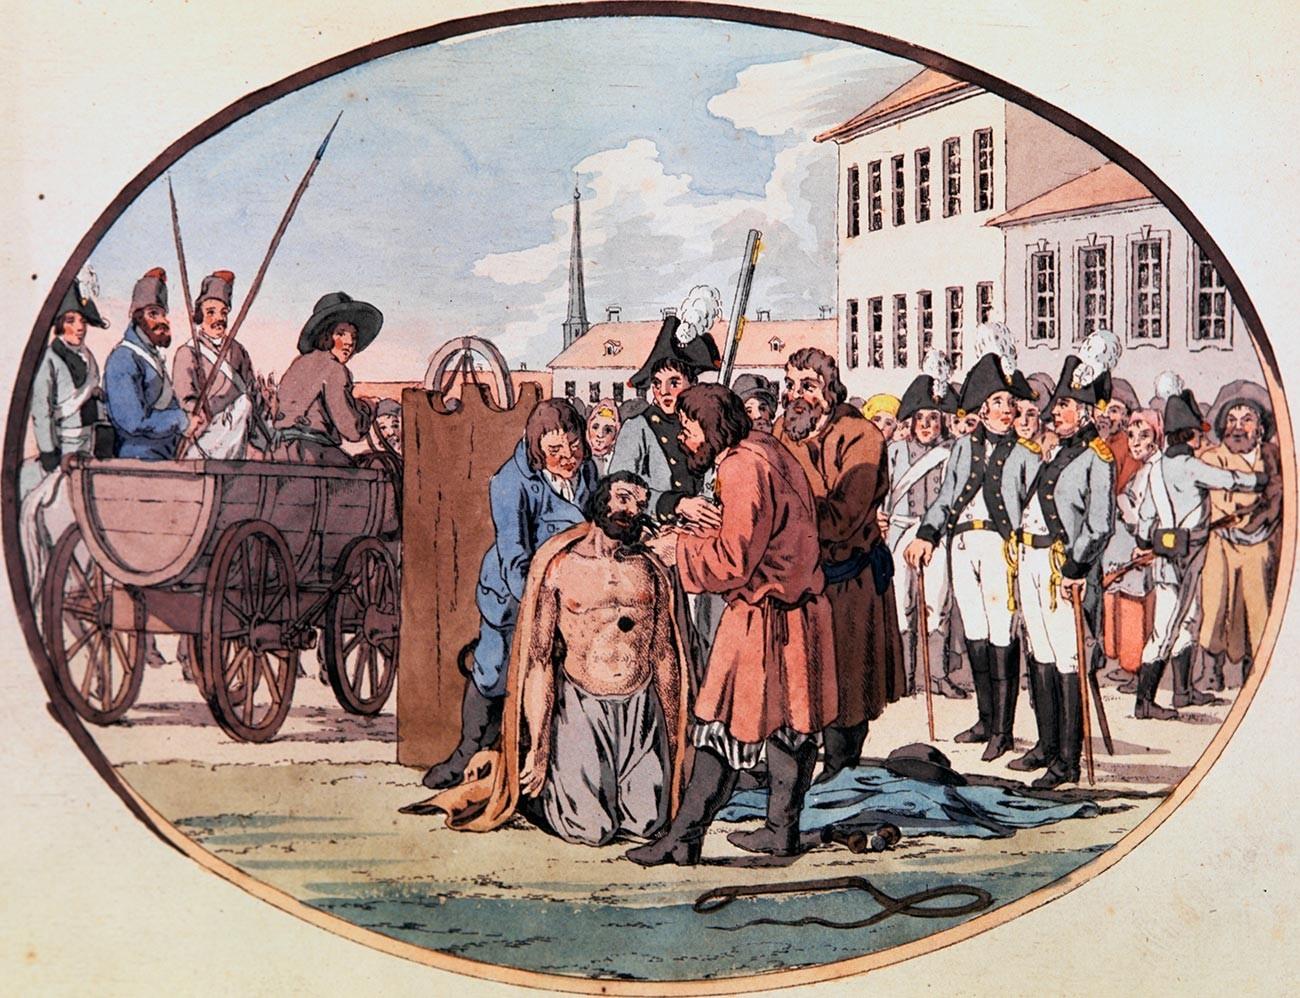 Hukuman menarik lubang hidung di Rusia, akhir abad ke-18.